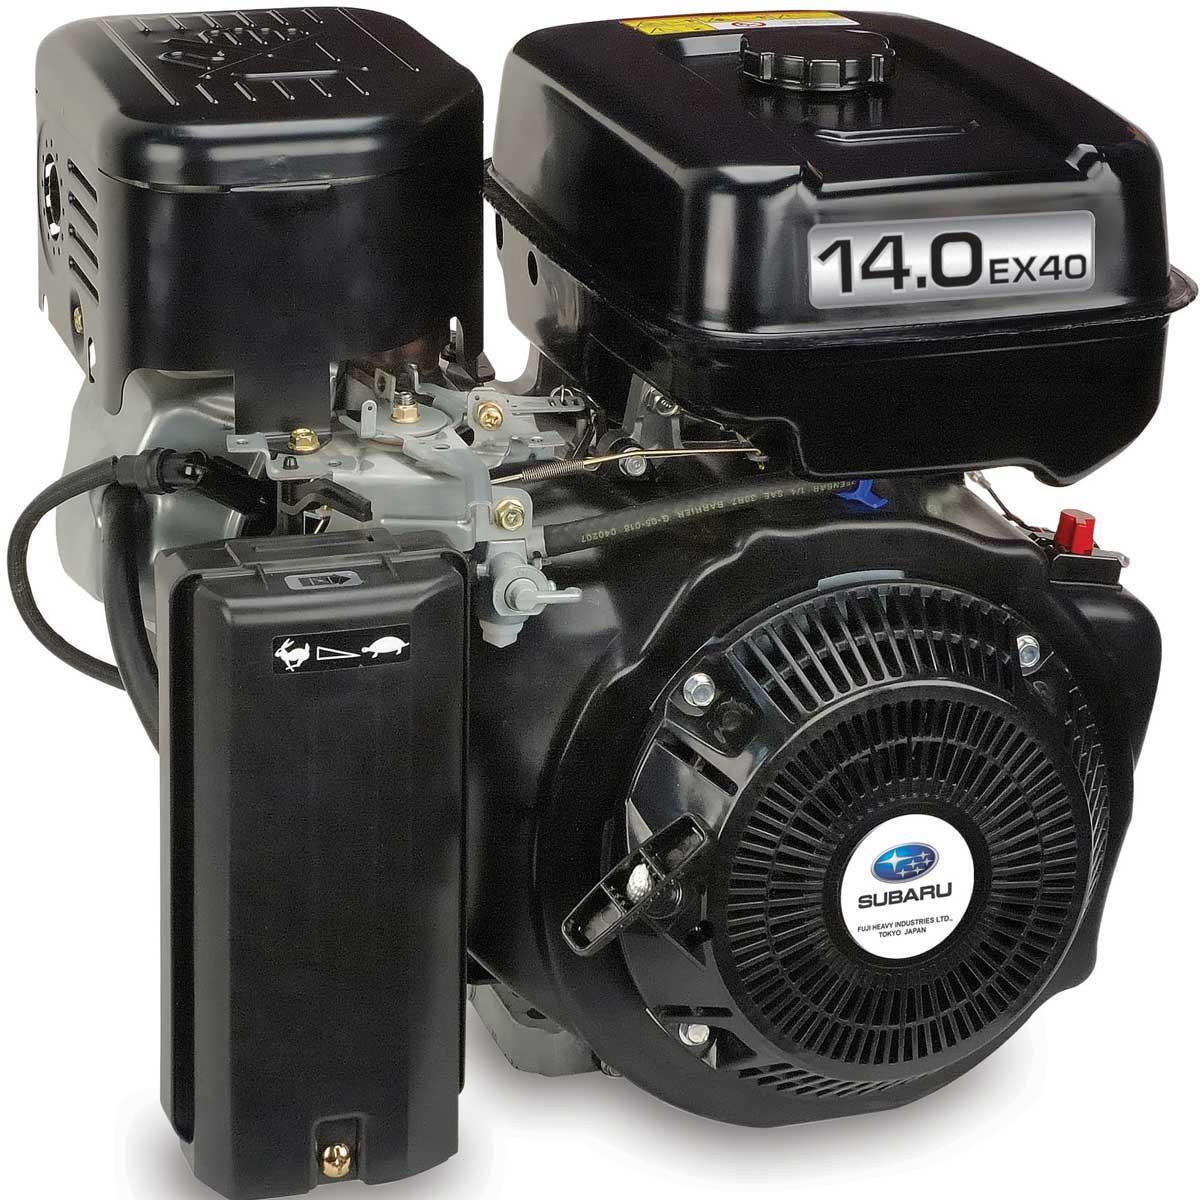 14hp Subaru engine for 7,500 watt portable generator